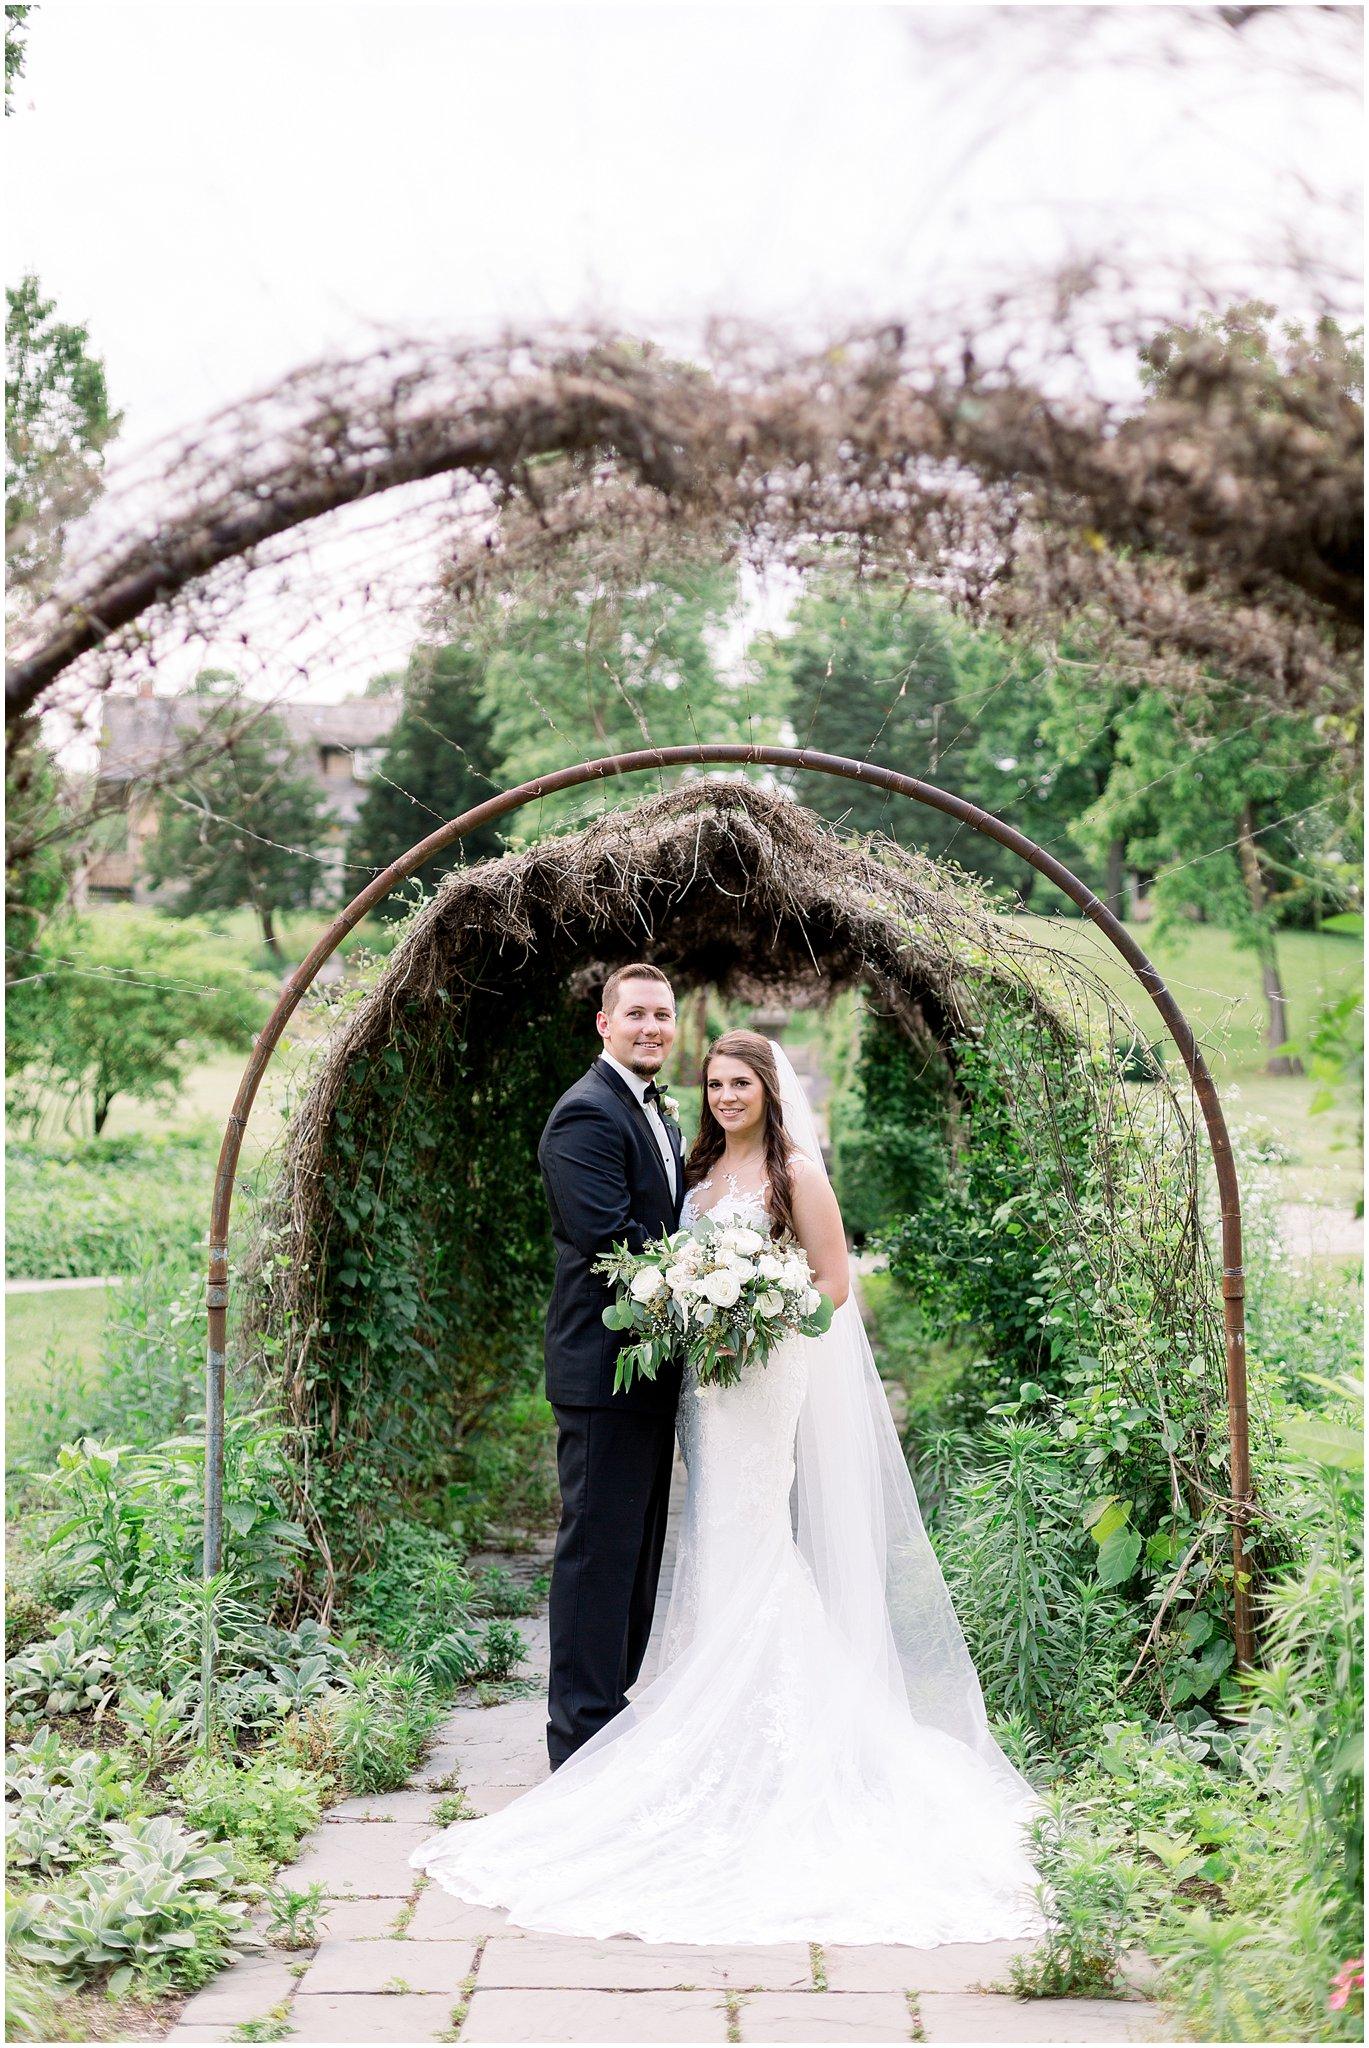 company-251-summer-chicago-wedding-photos_0044.jpg